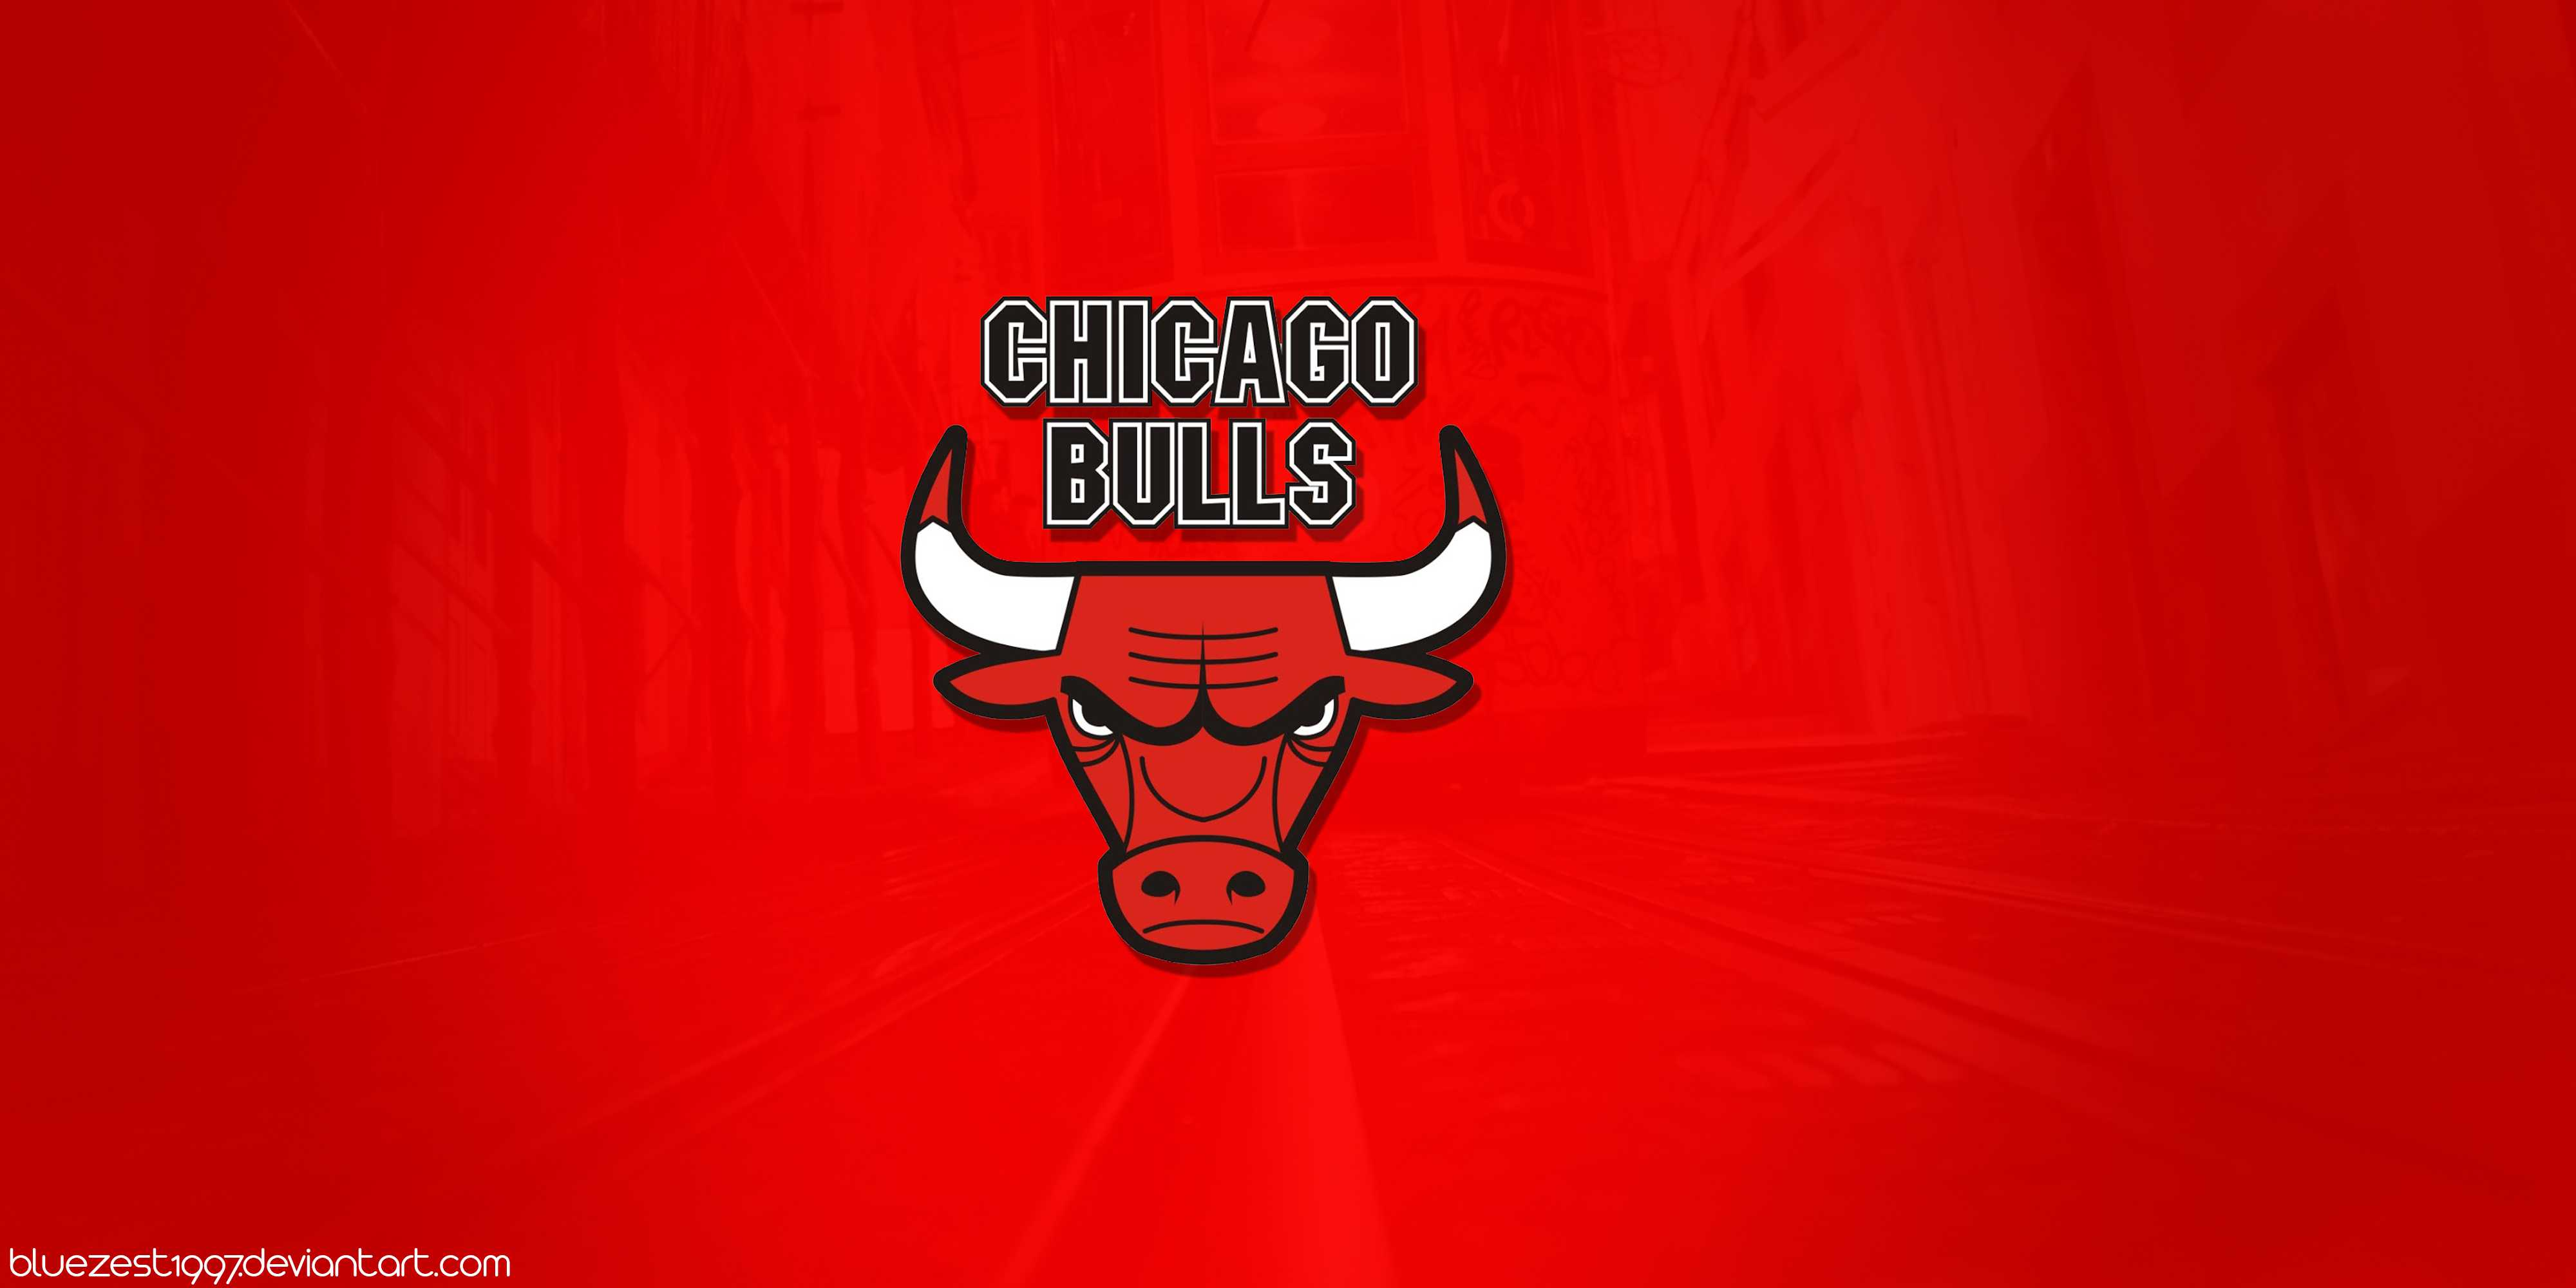 Chicago Bulls Wallpapers Hd J22O   WALLEOCO   WALLEOCO 4000x2000